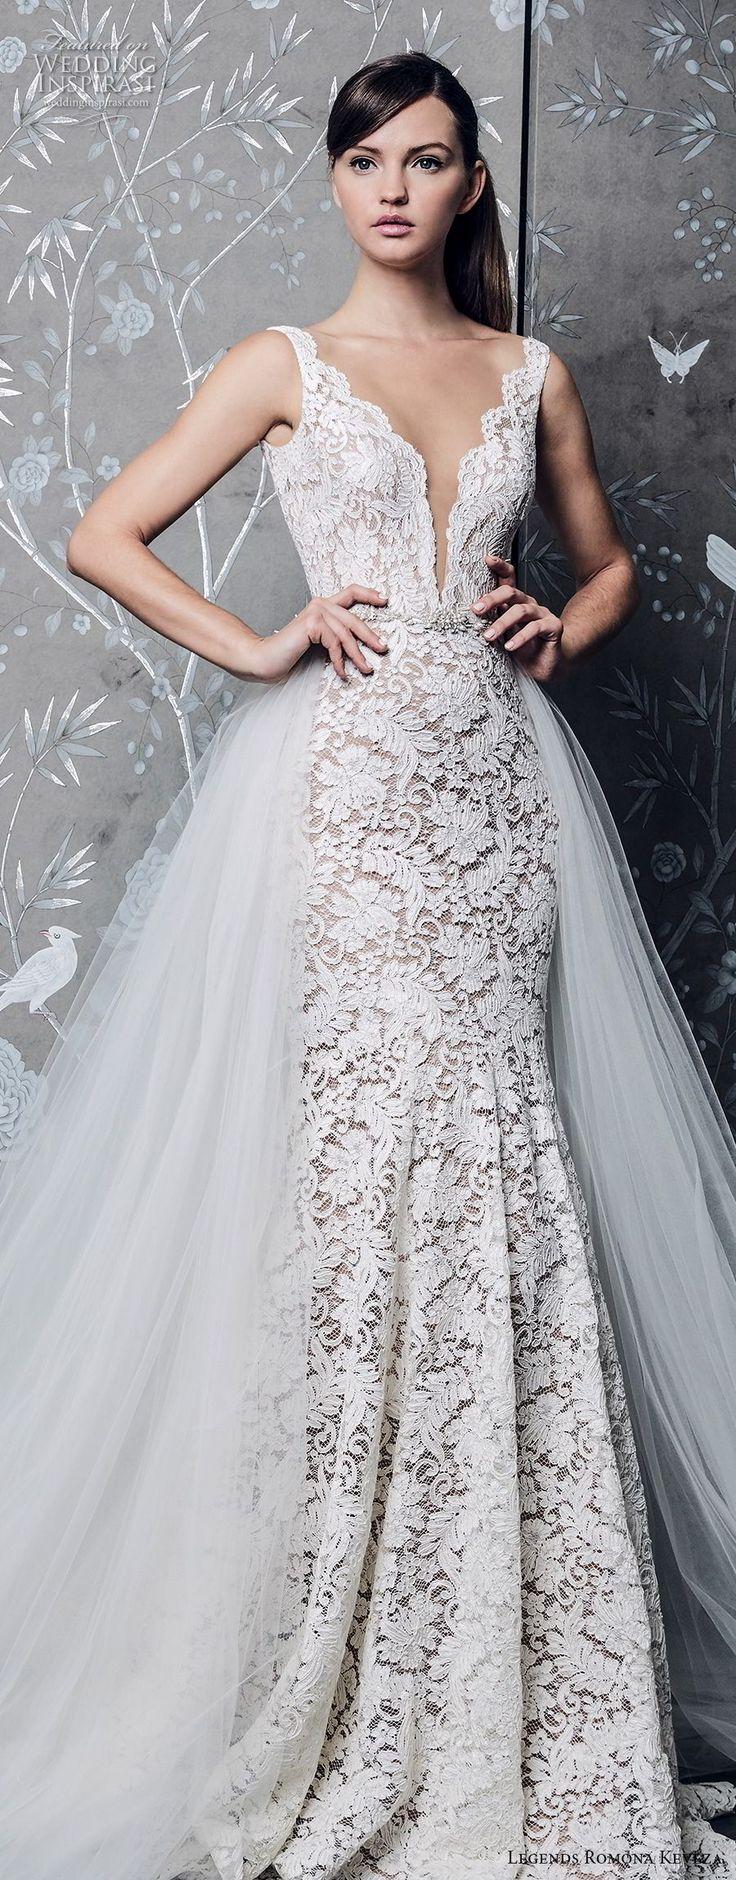 legends romona keveza fall 2018 sleeveless deep v neck full embellishment elegant romantic a line wedding dress a line overskirt chapel train (1) lv -- Legends Romona Keveza Fall 2018 Wedding Dresses